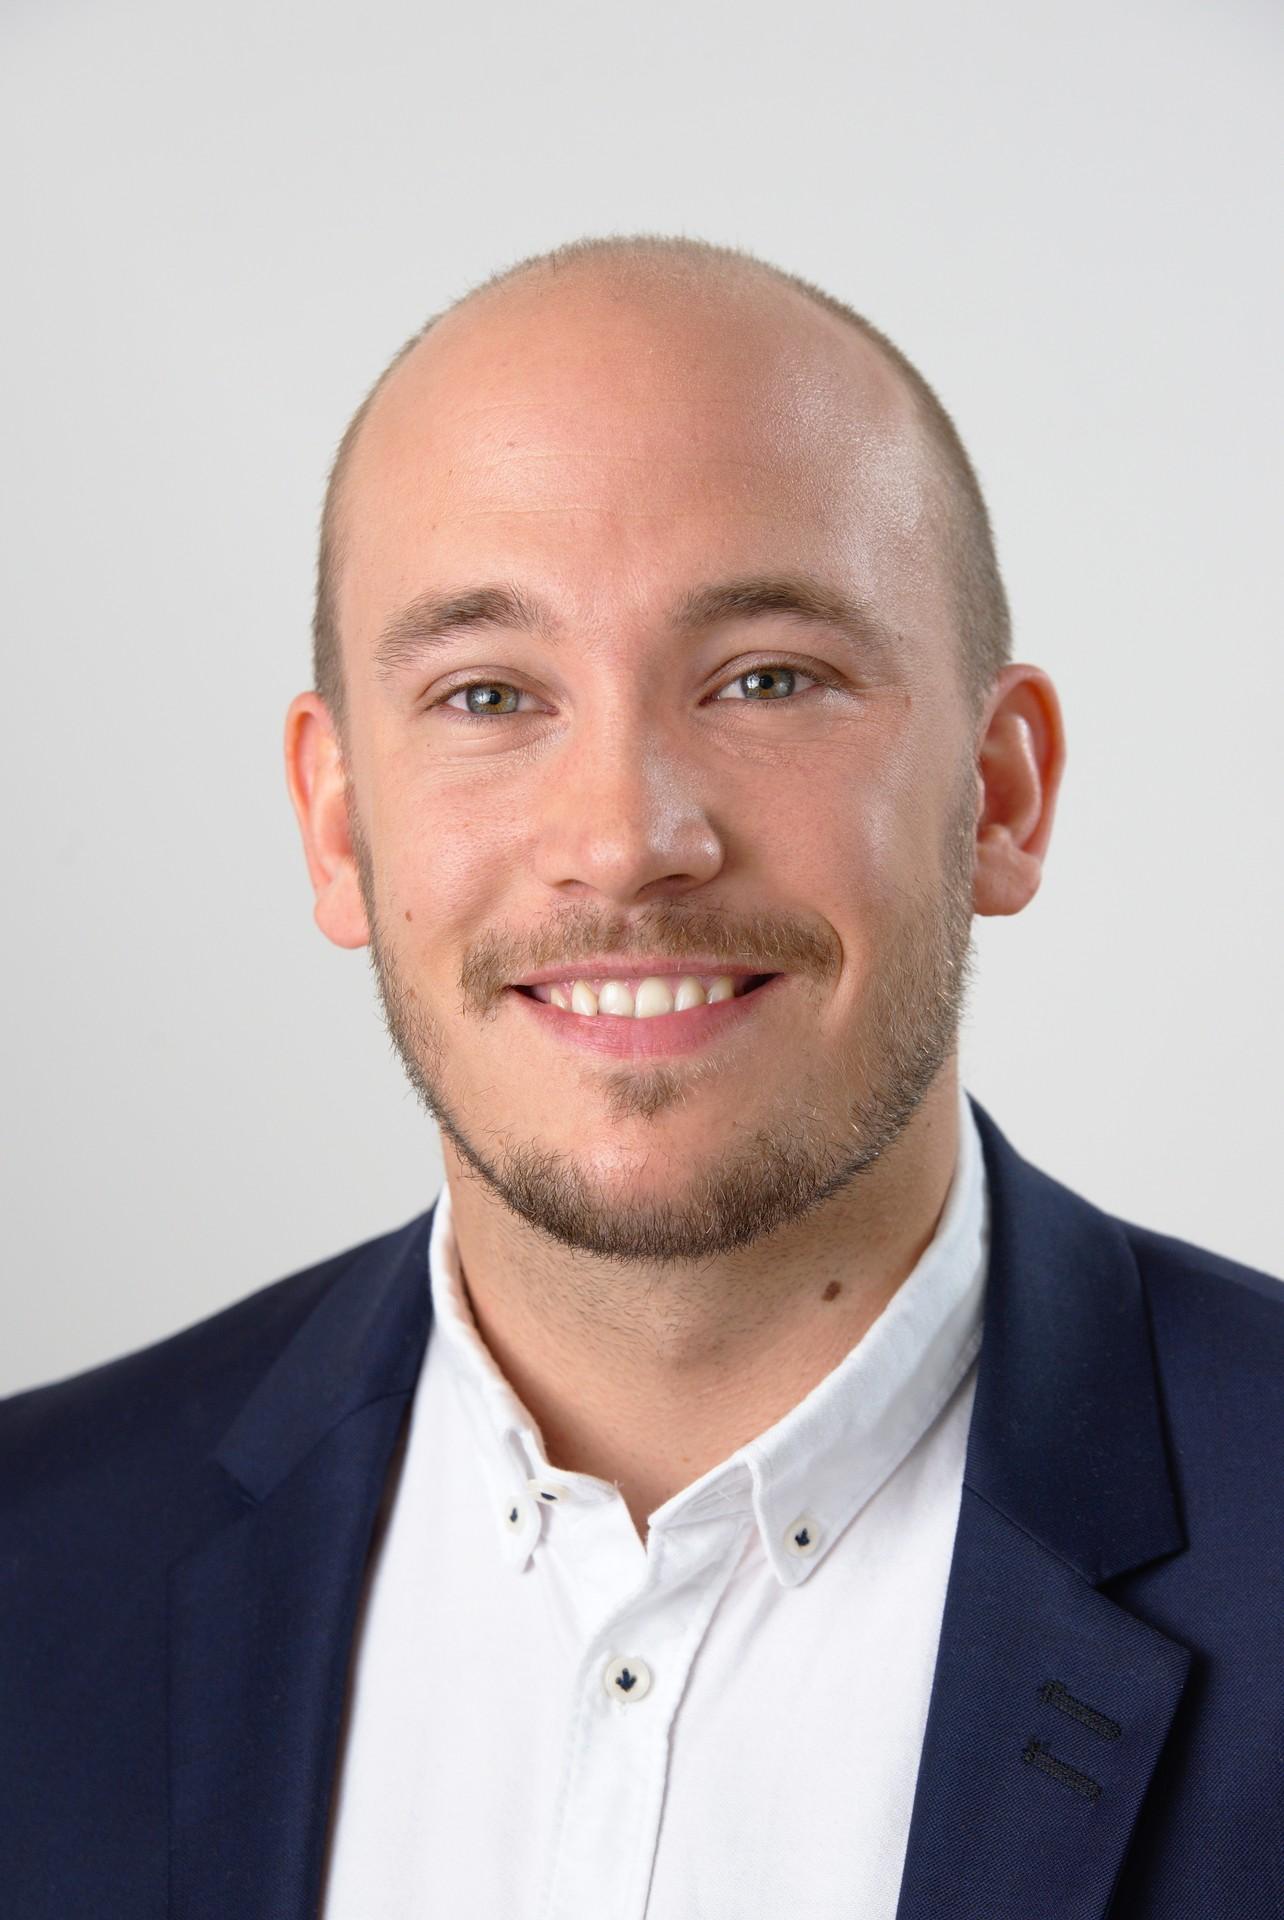 Hannes Oberortner, BSc.